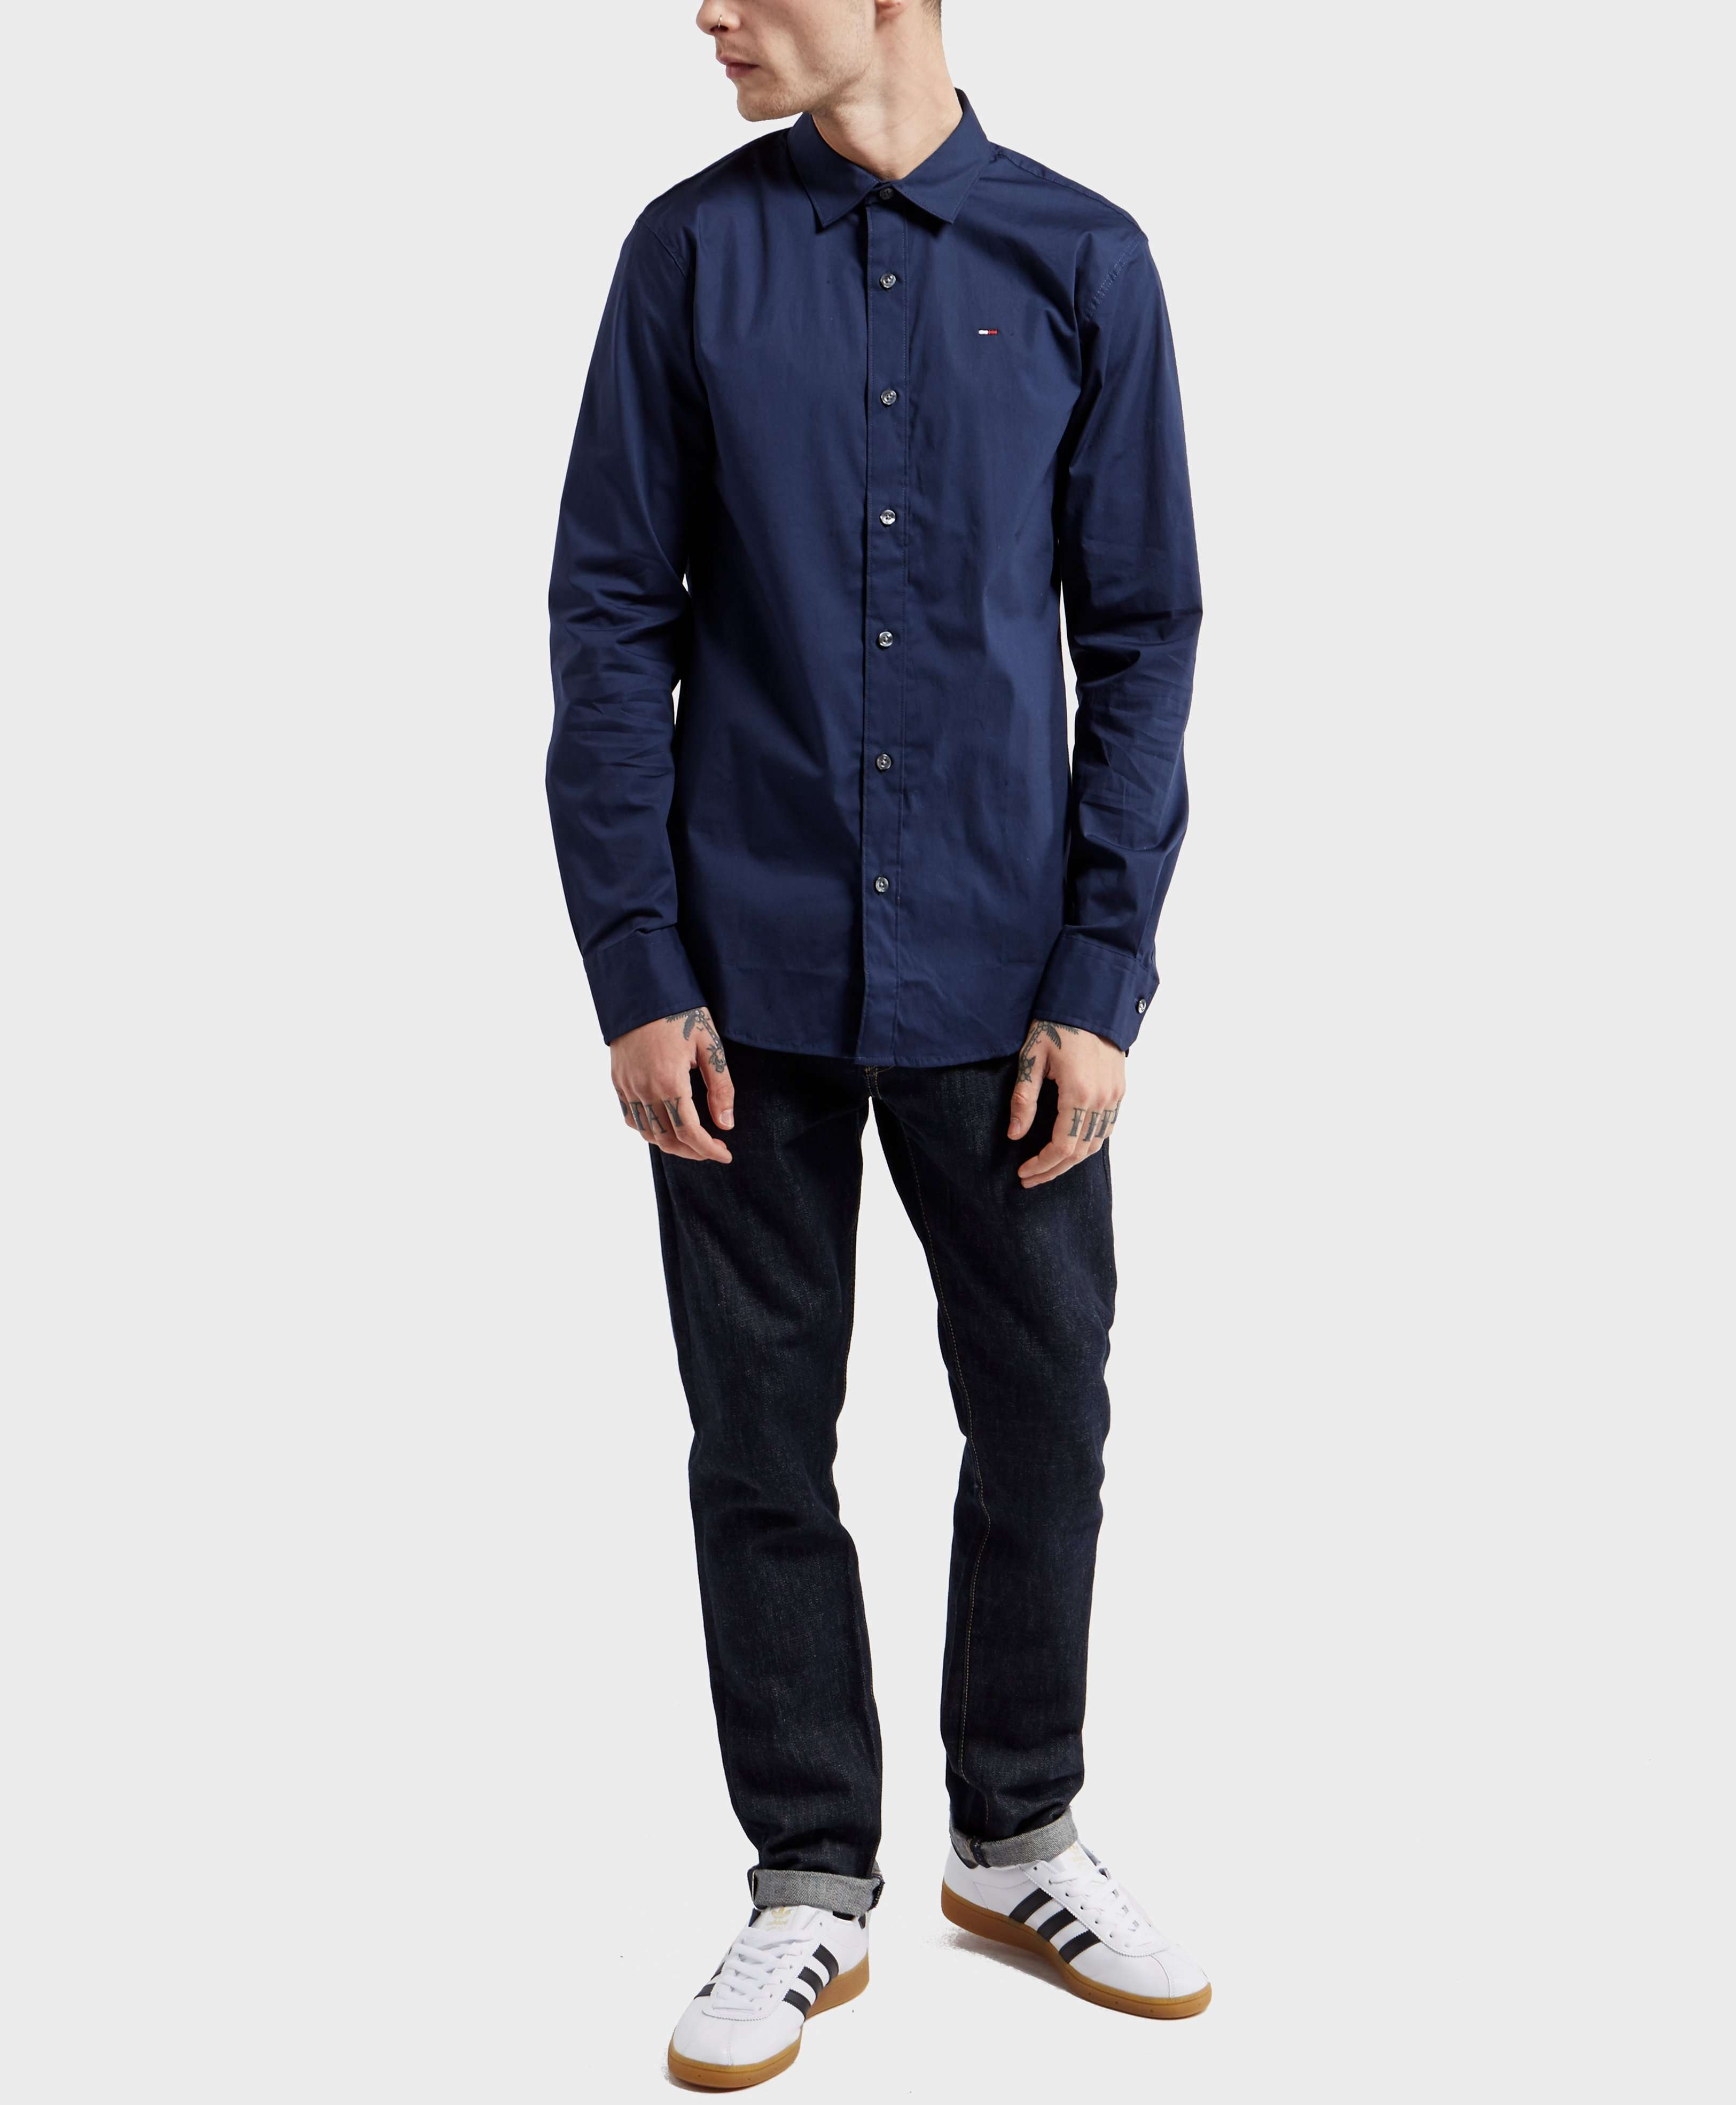 Tommy Hilfiger Stretch Long-Sleeve Shirt